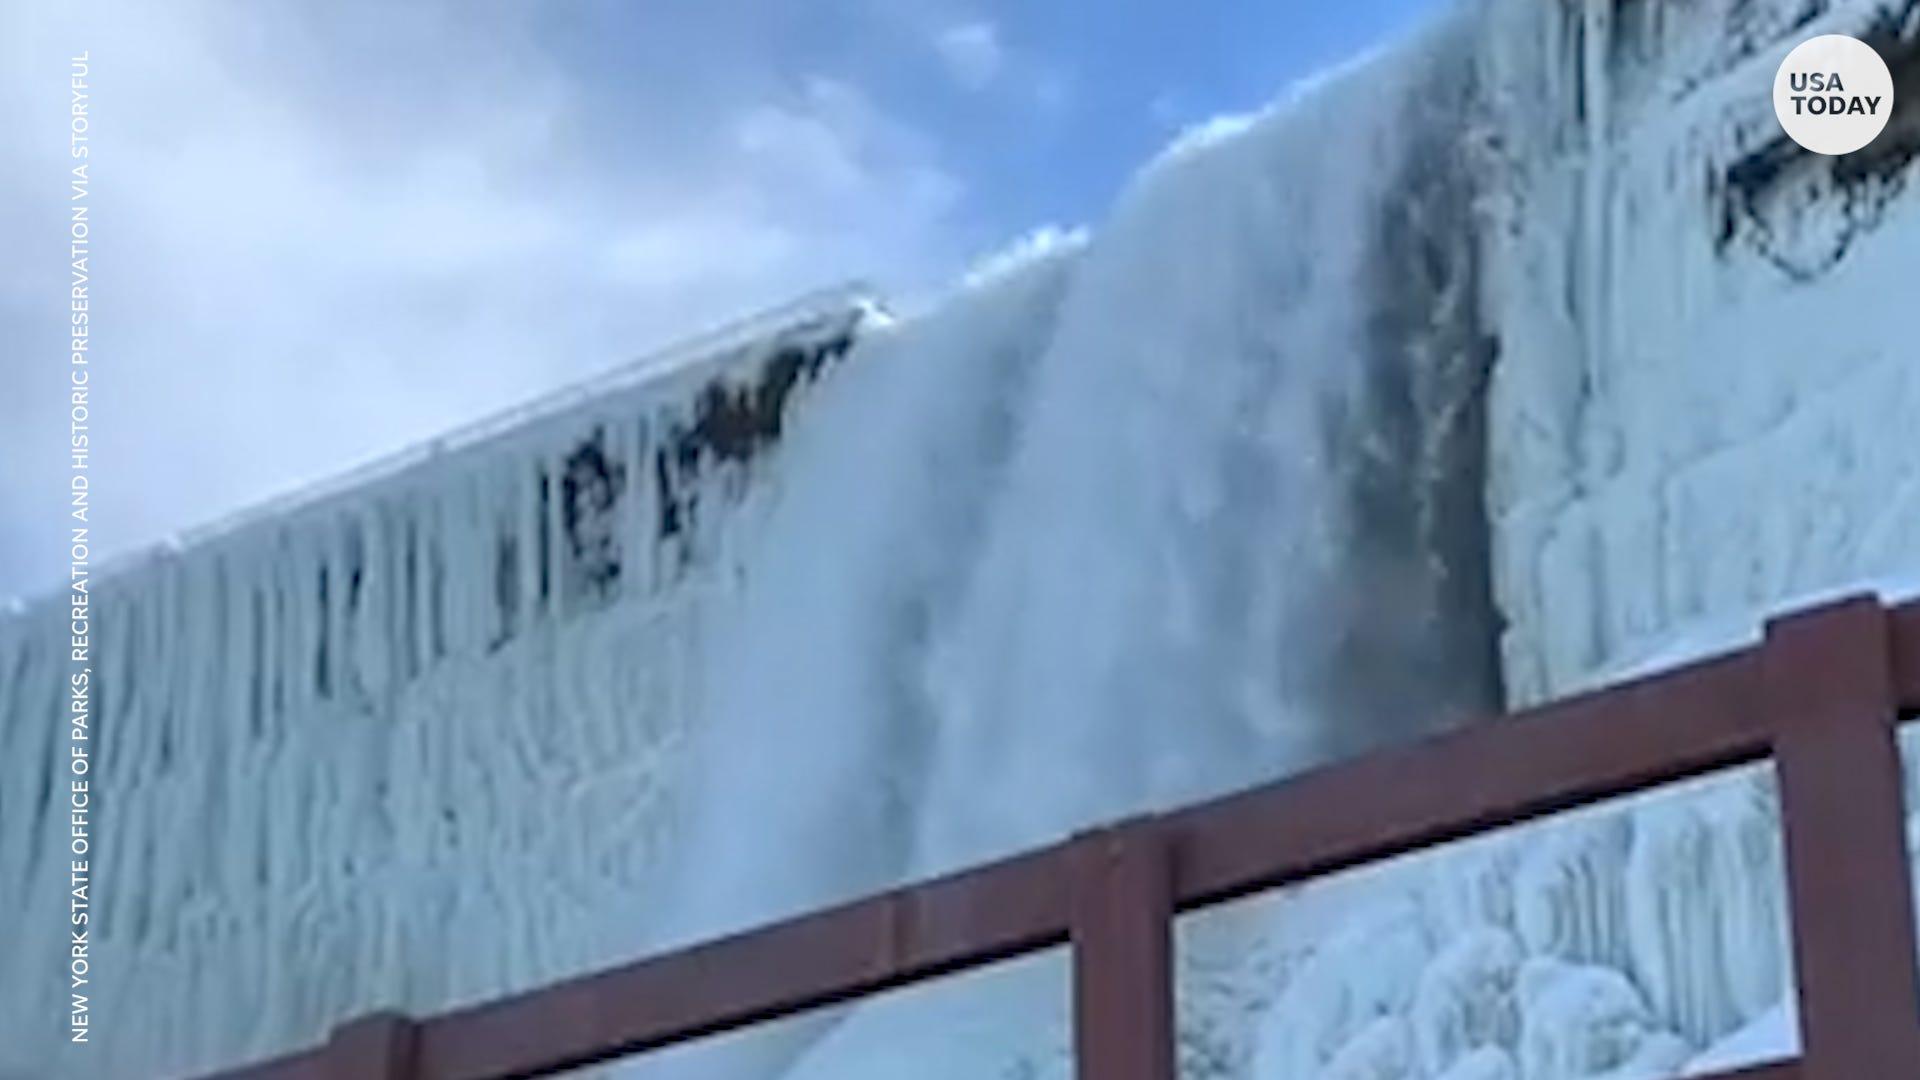 Is Niagara Falls more beautiful when it's flowing or frozen? You decide.